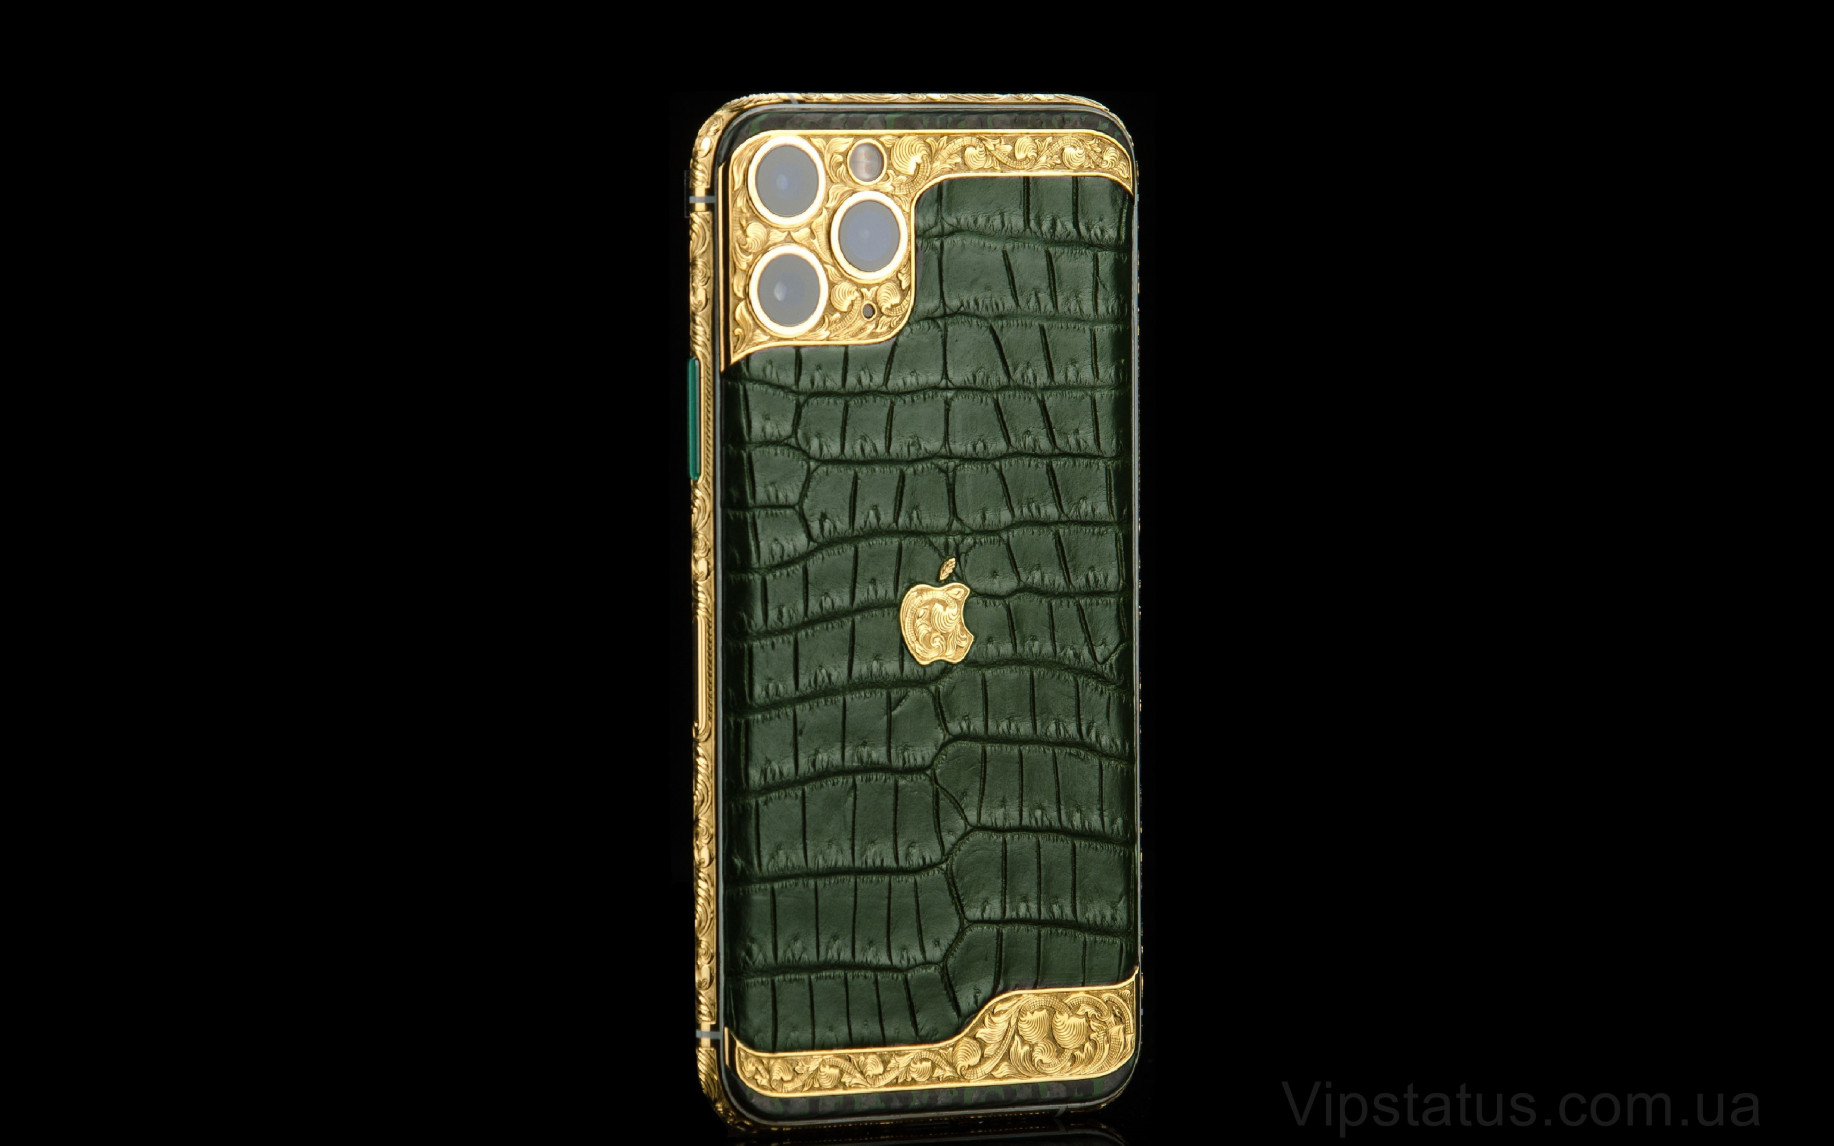 Elite Eastern Emerald IPHONE 11 PRO 512 GB Eastern Emerald IPHONE 11 PRO 512 GB image 1